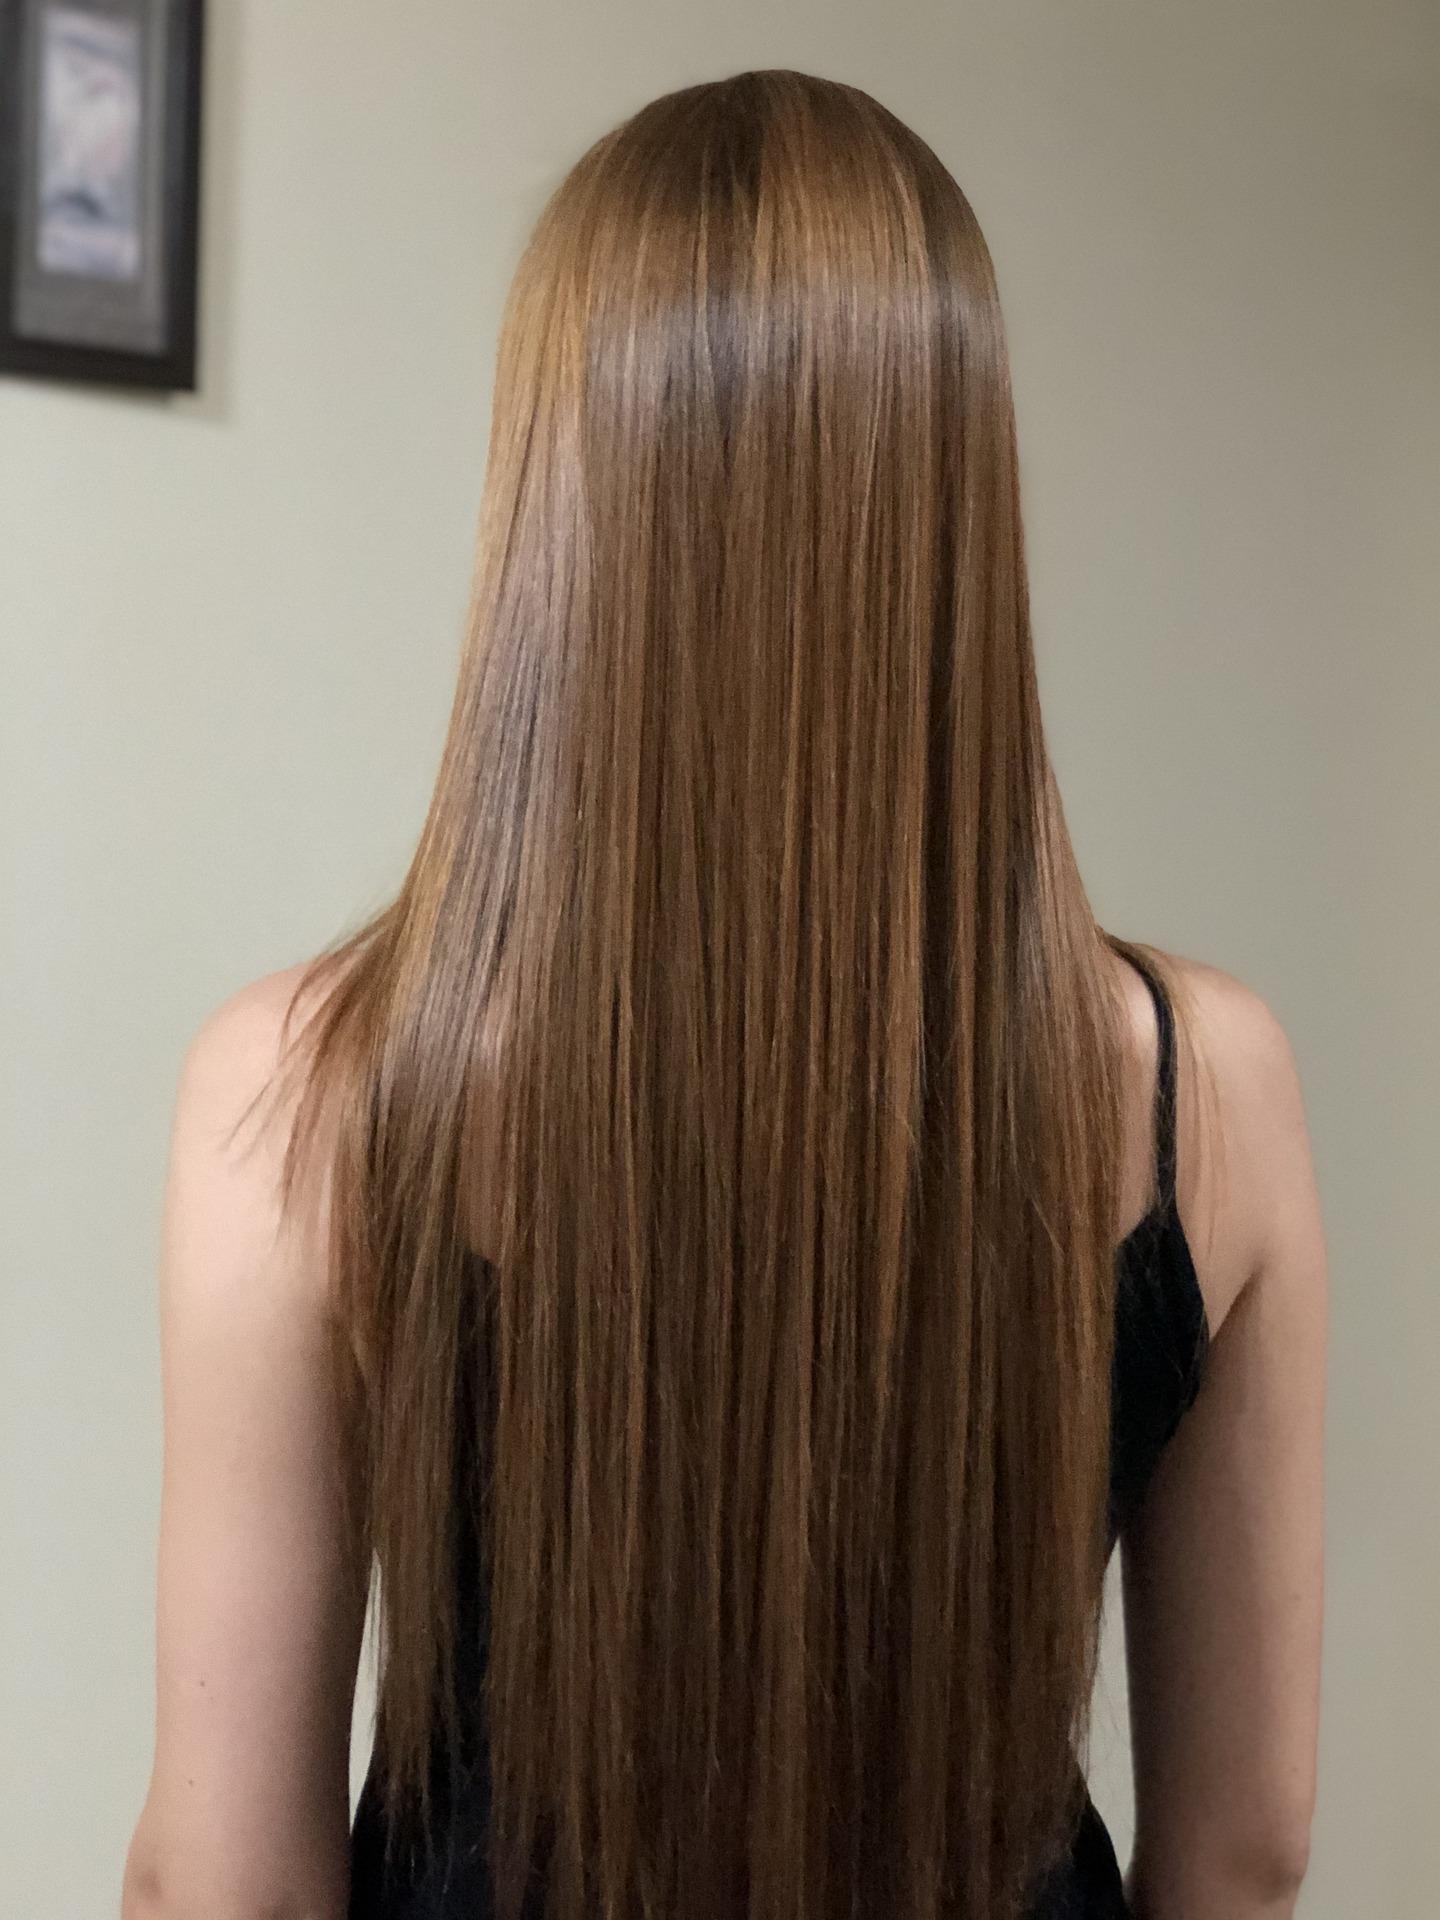 Natural ways to Straighten your hair